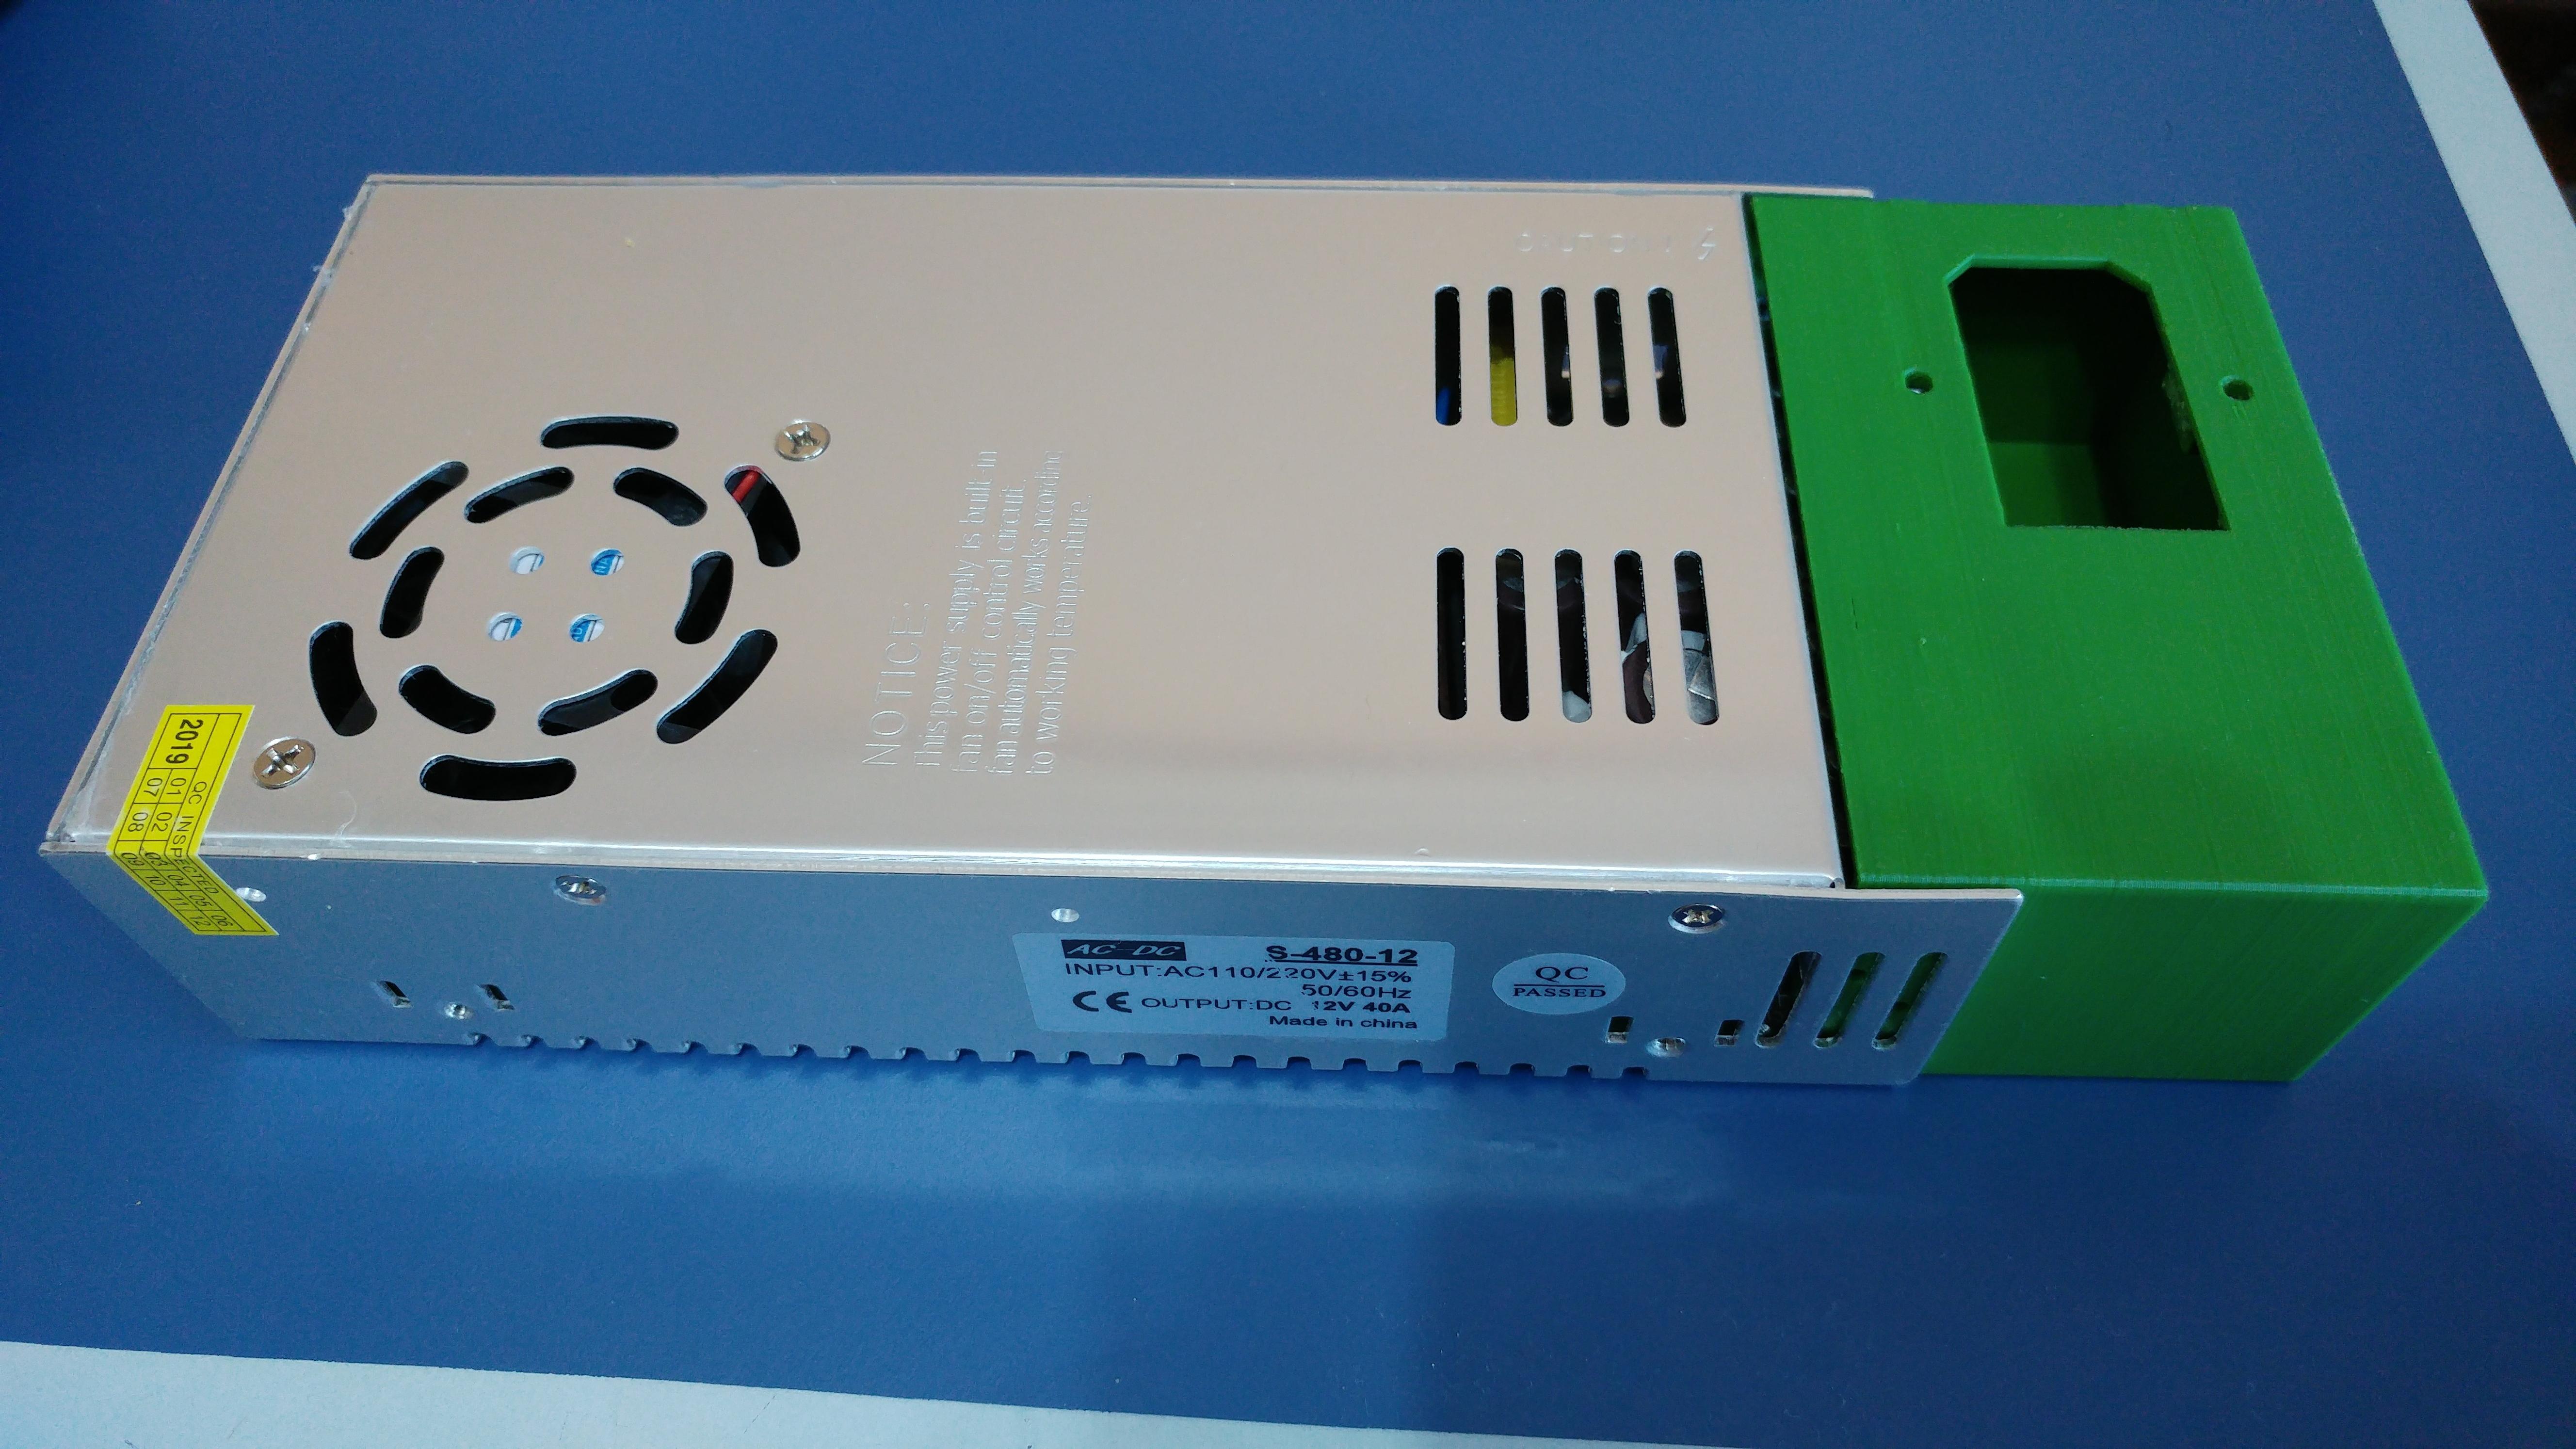 20190816_123313.jpg Télécharger fichier STL gratuit Carcasa Fuente de Alimentación con interruptor de encendido • Plan pour imprimante 3D, celtarra12